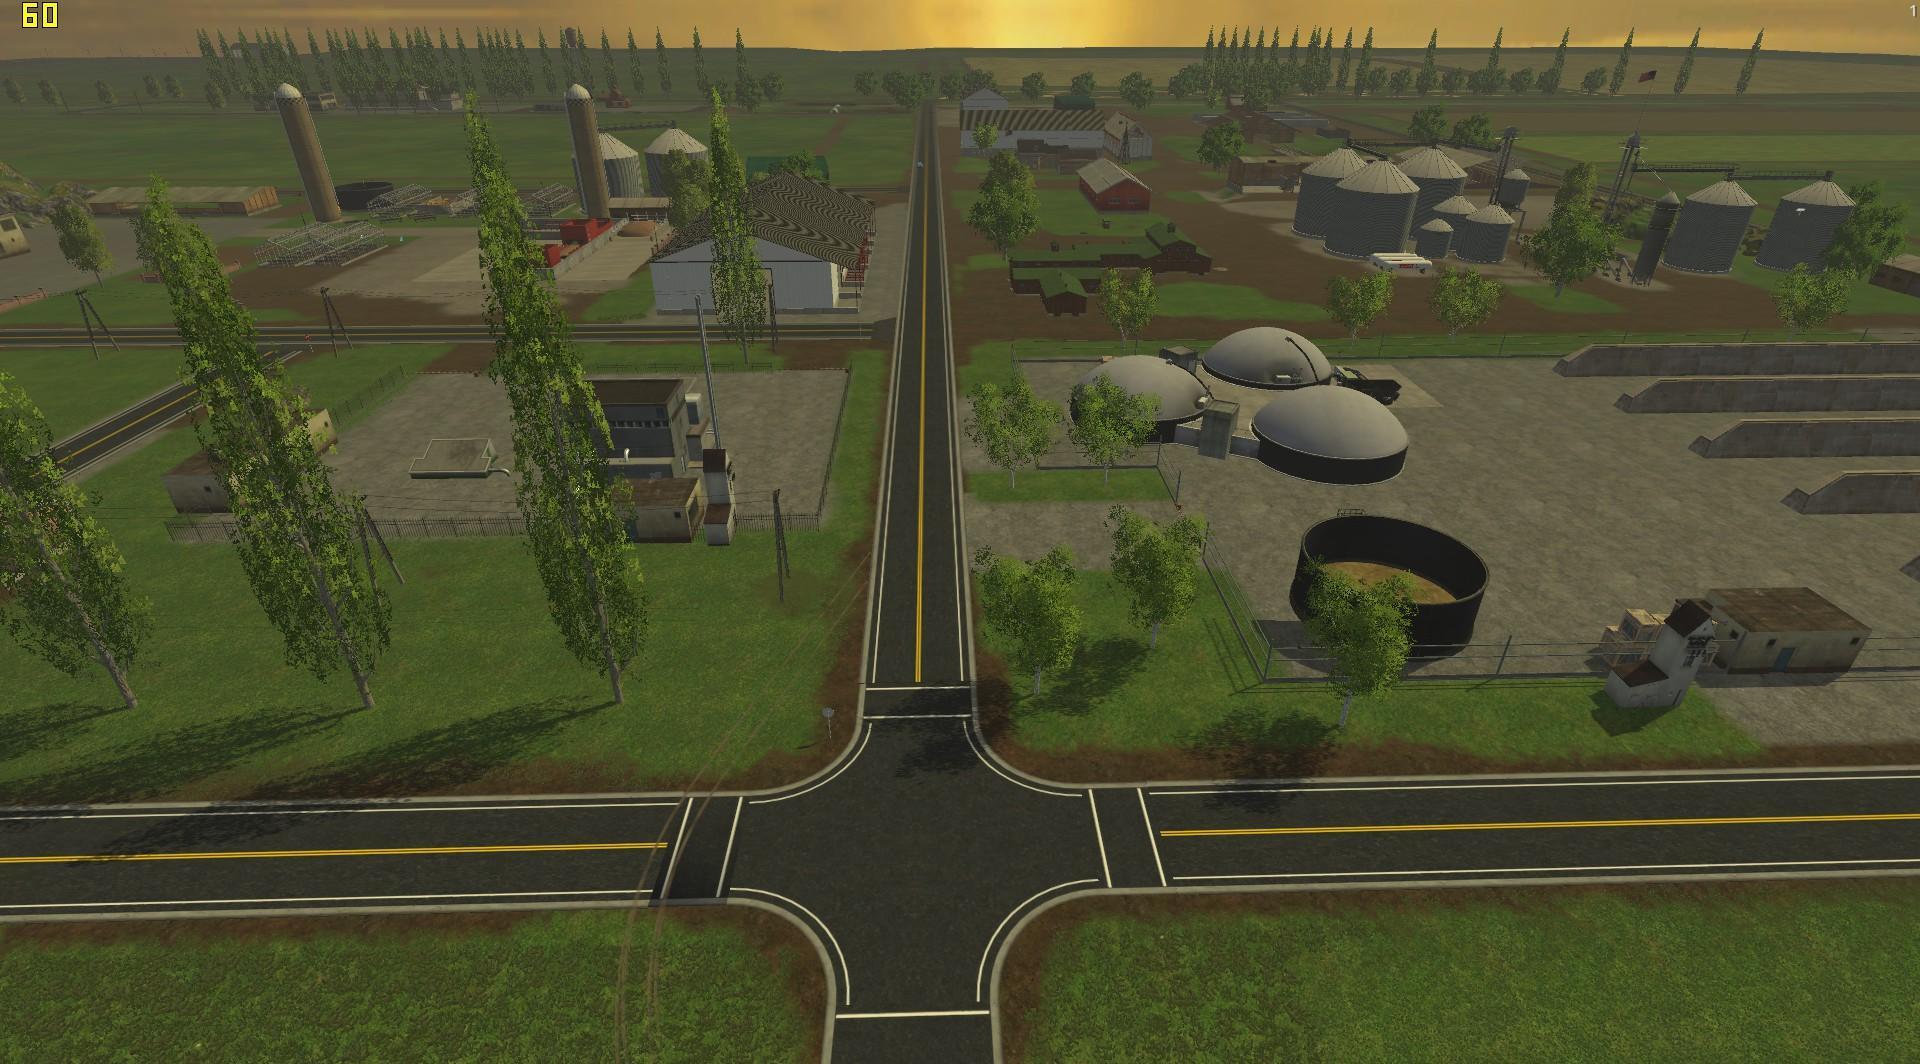 STATES MAP V6 Farming simulator 2017 2015 15 17 LS mod